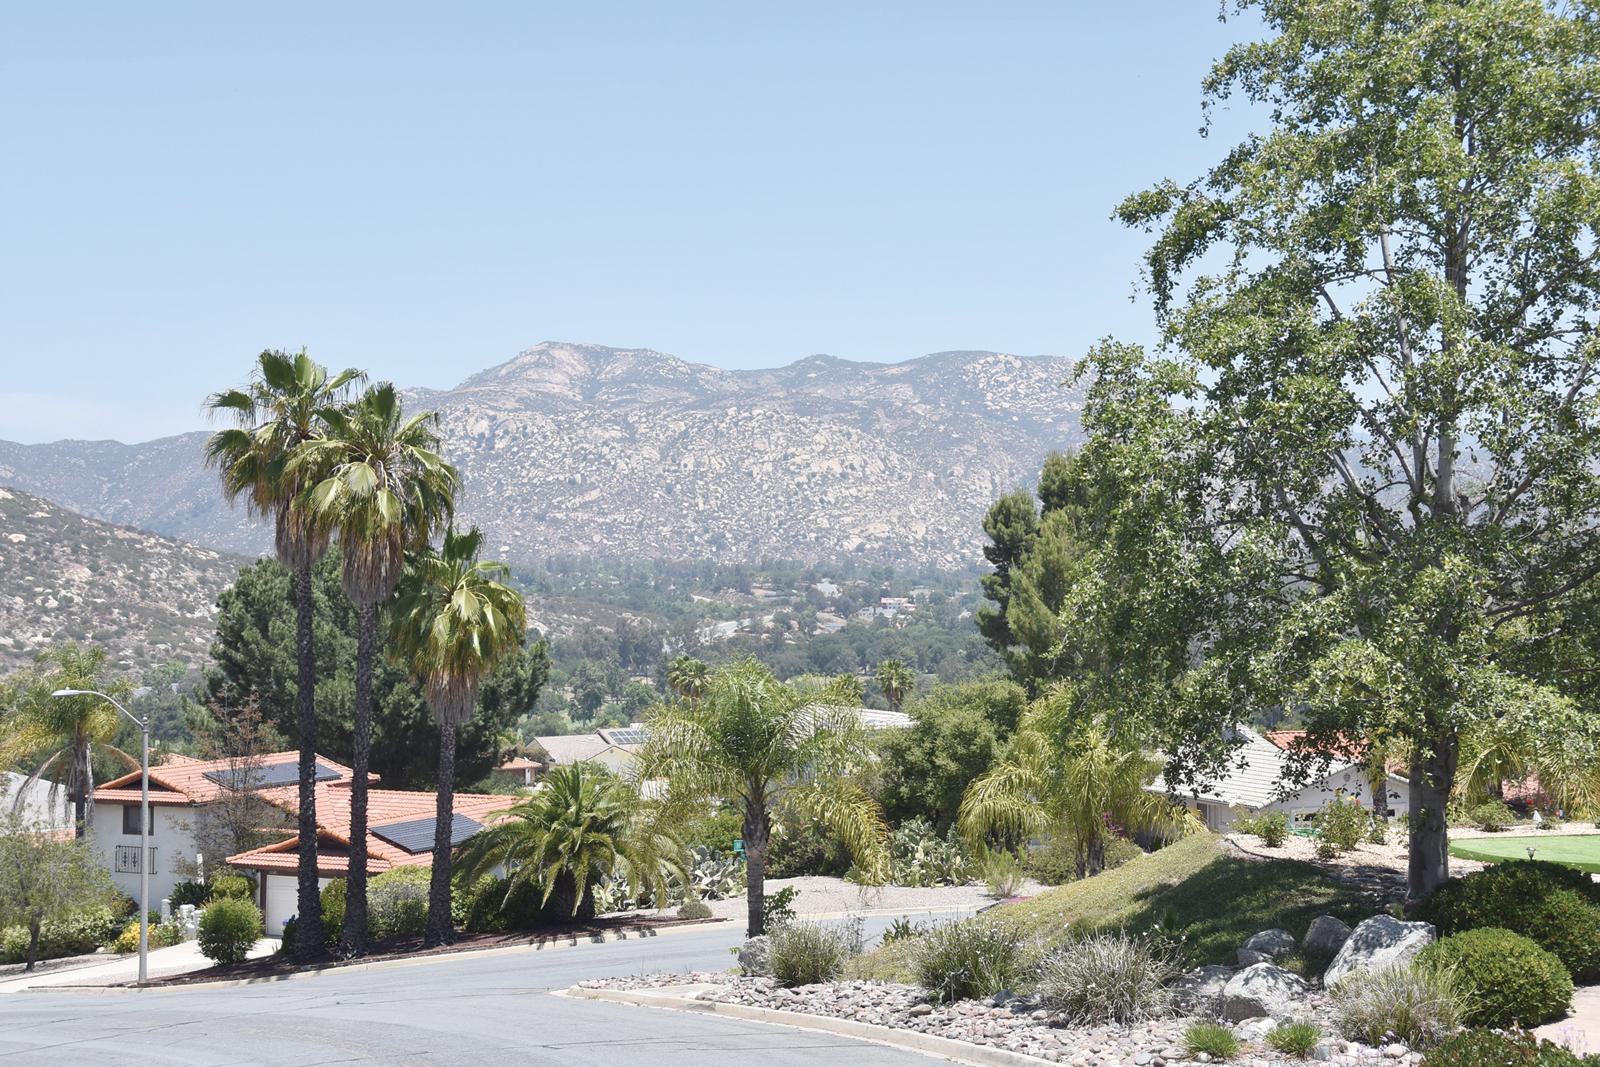 San Diego Country Estates . Photo by Darrel Kinney